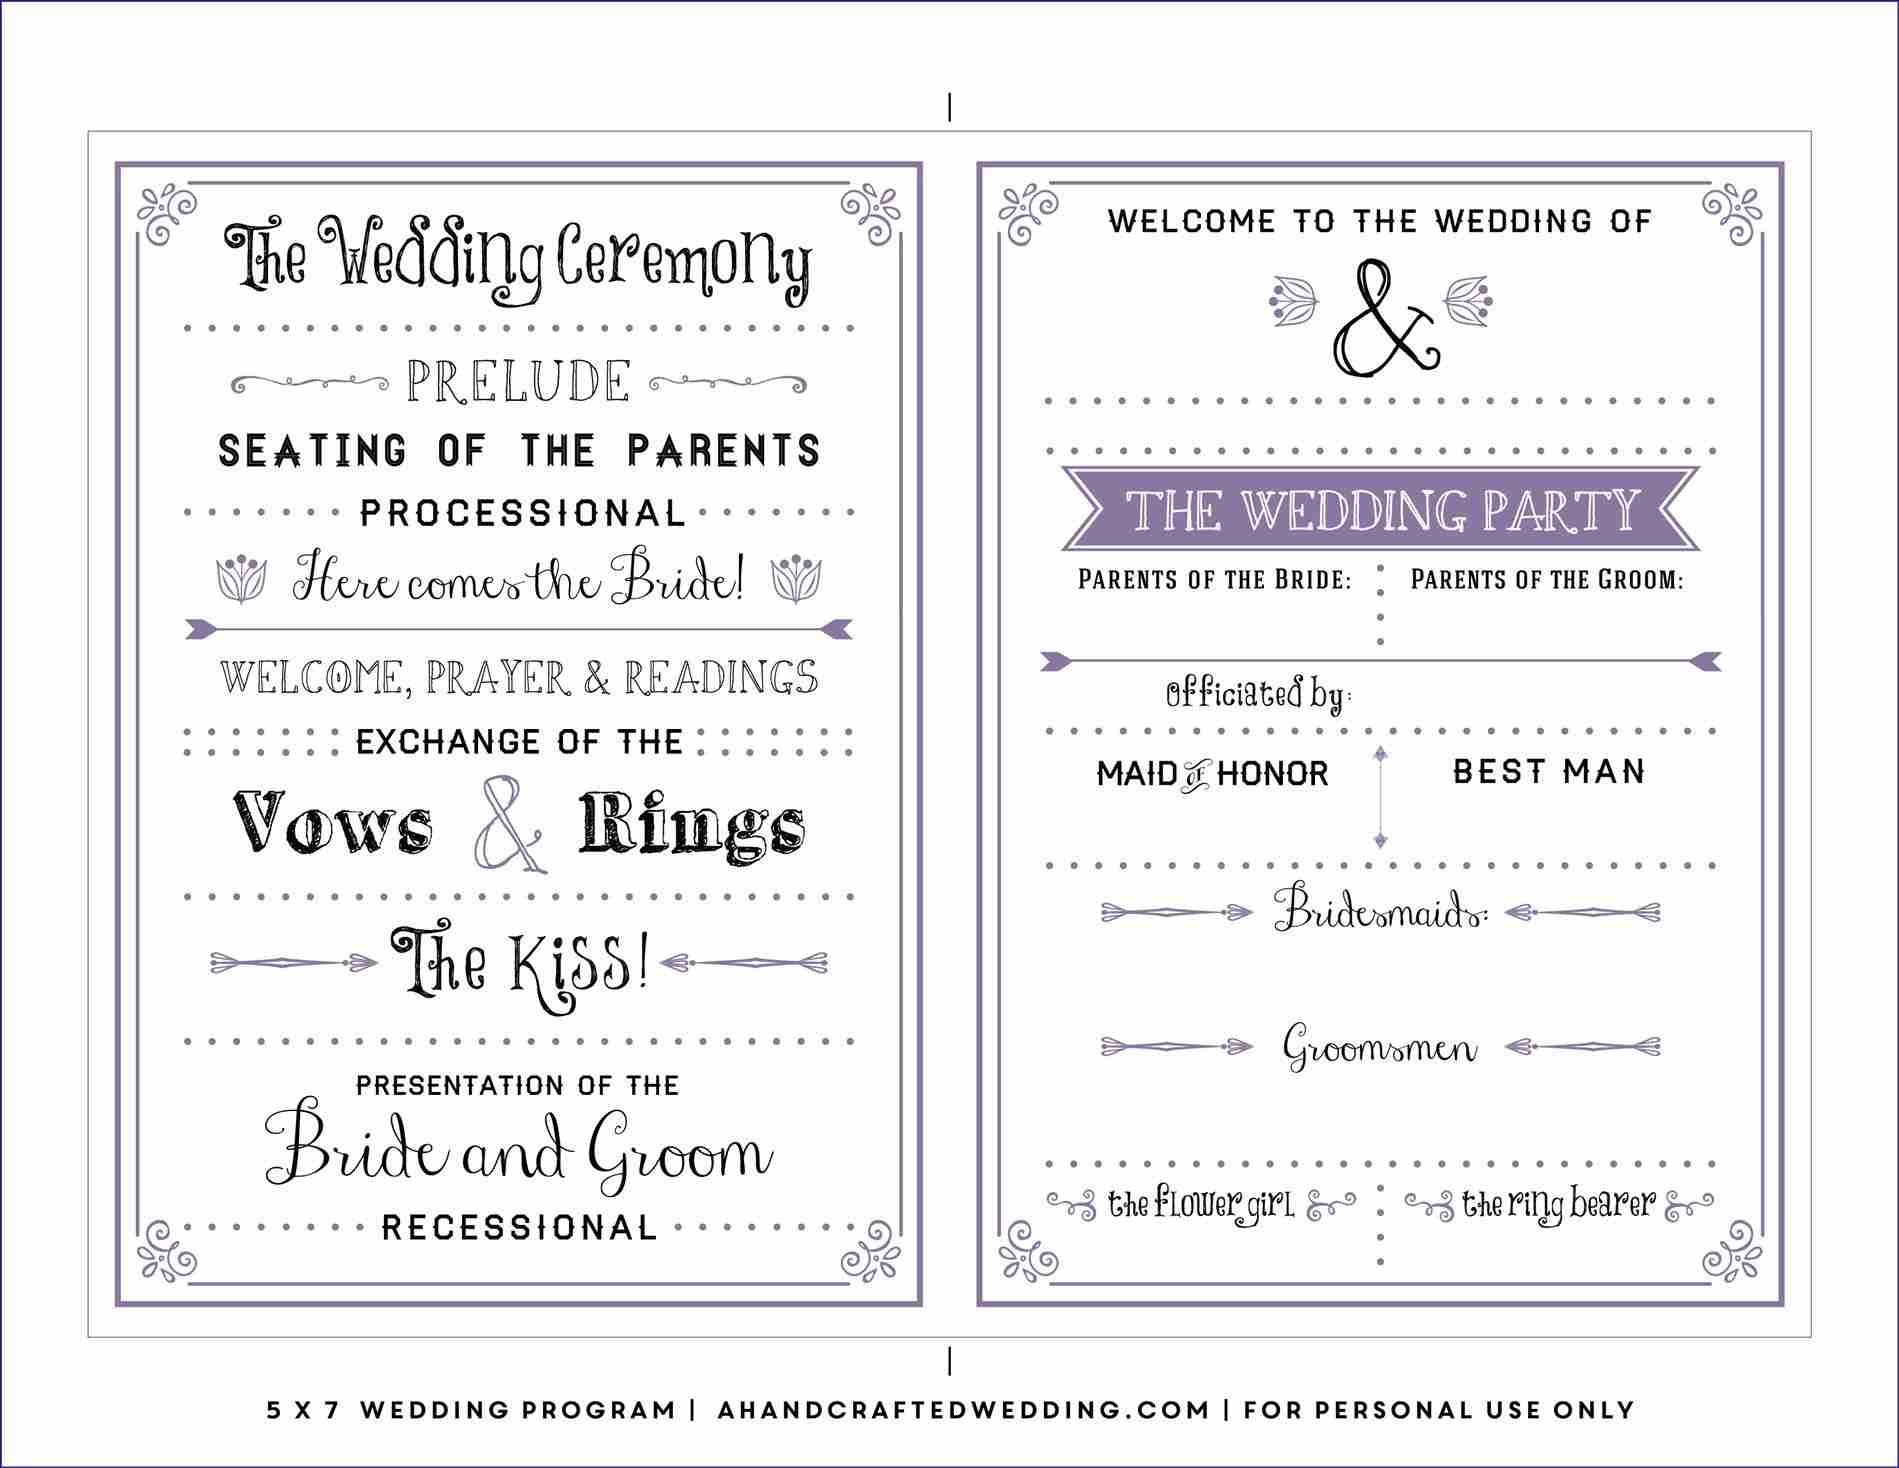 Free Downloadable Wedding Program Template That Can Be Printed - Free Printable Wedding Fan Templates